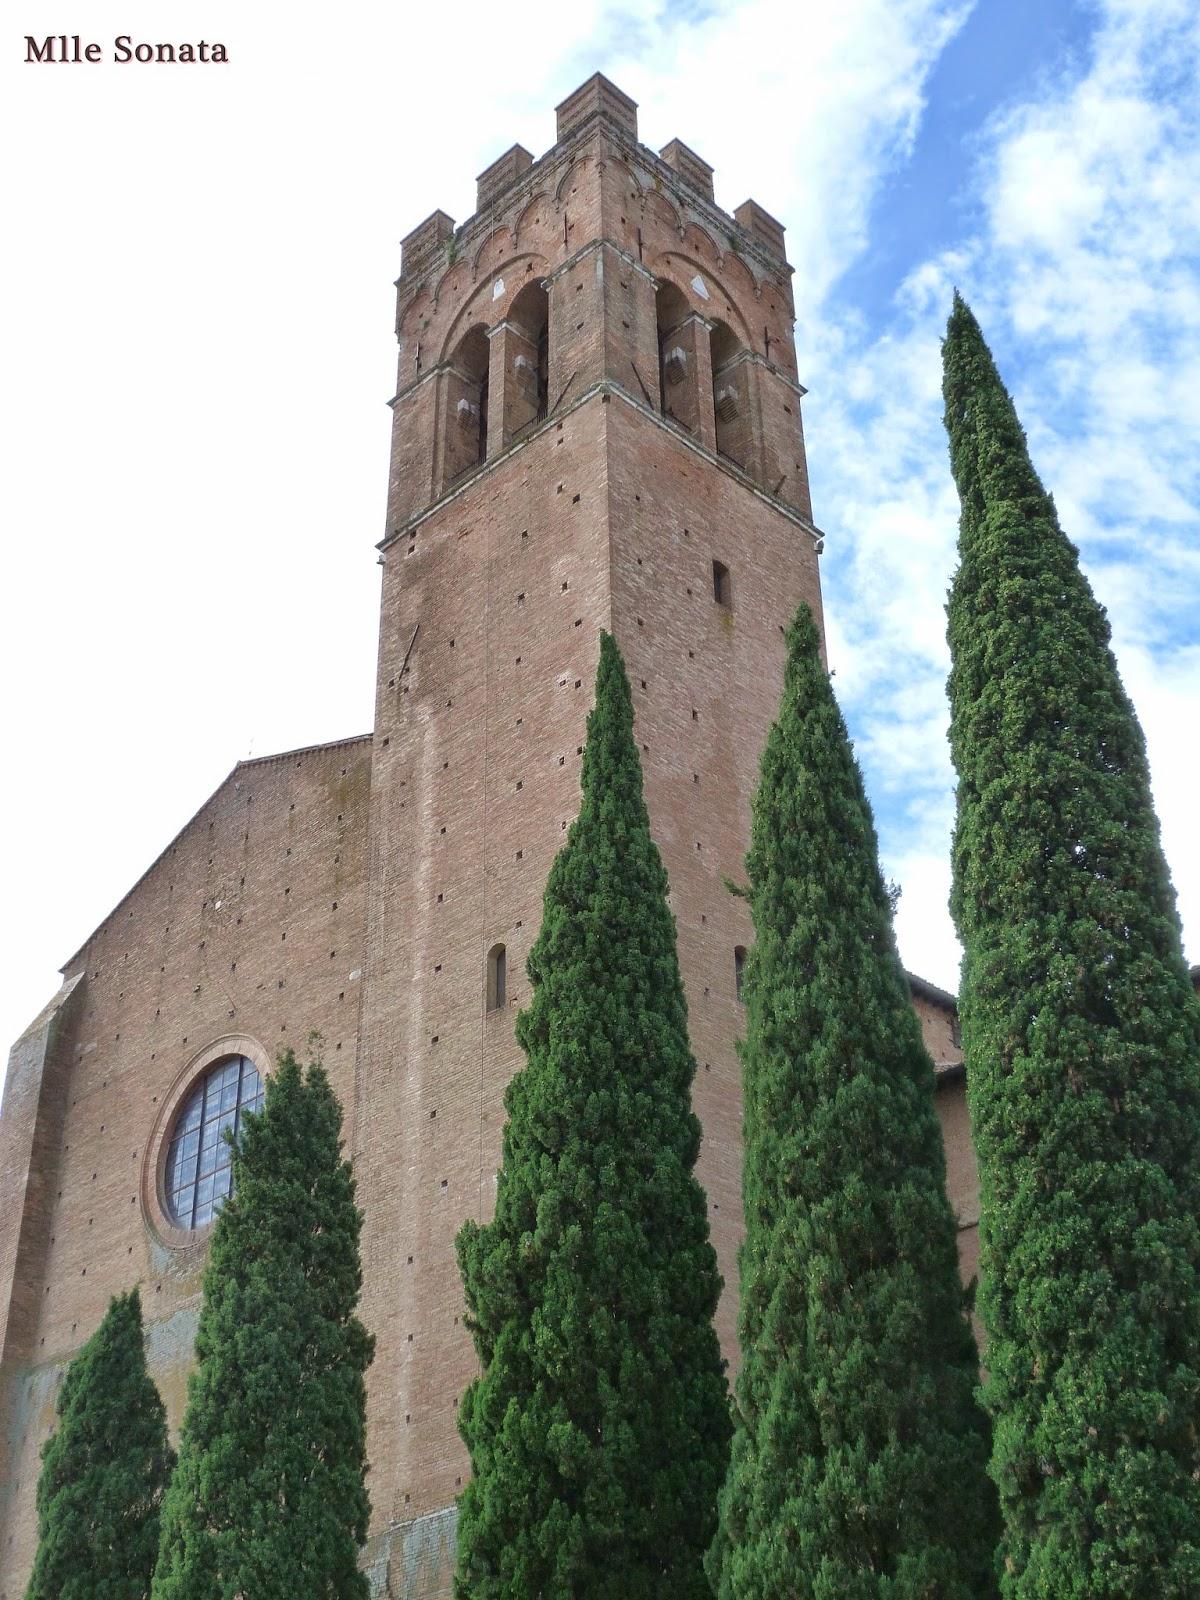 Voyage Italie Sienne Basilique San Domenico